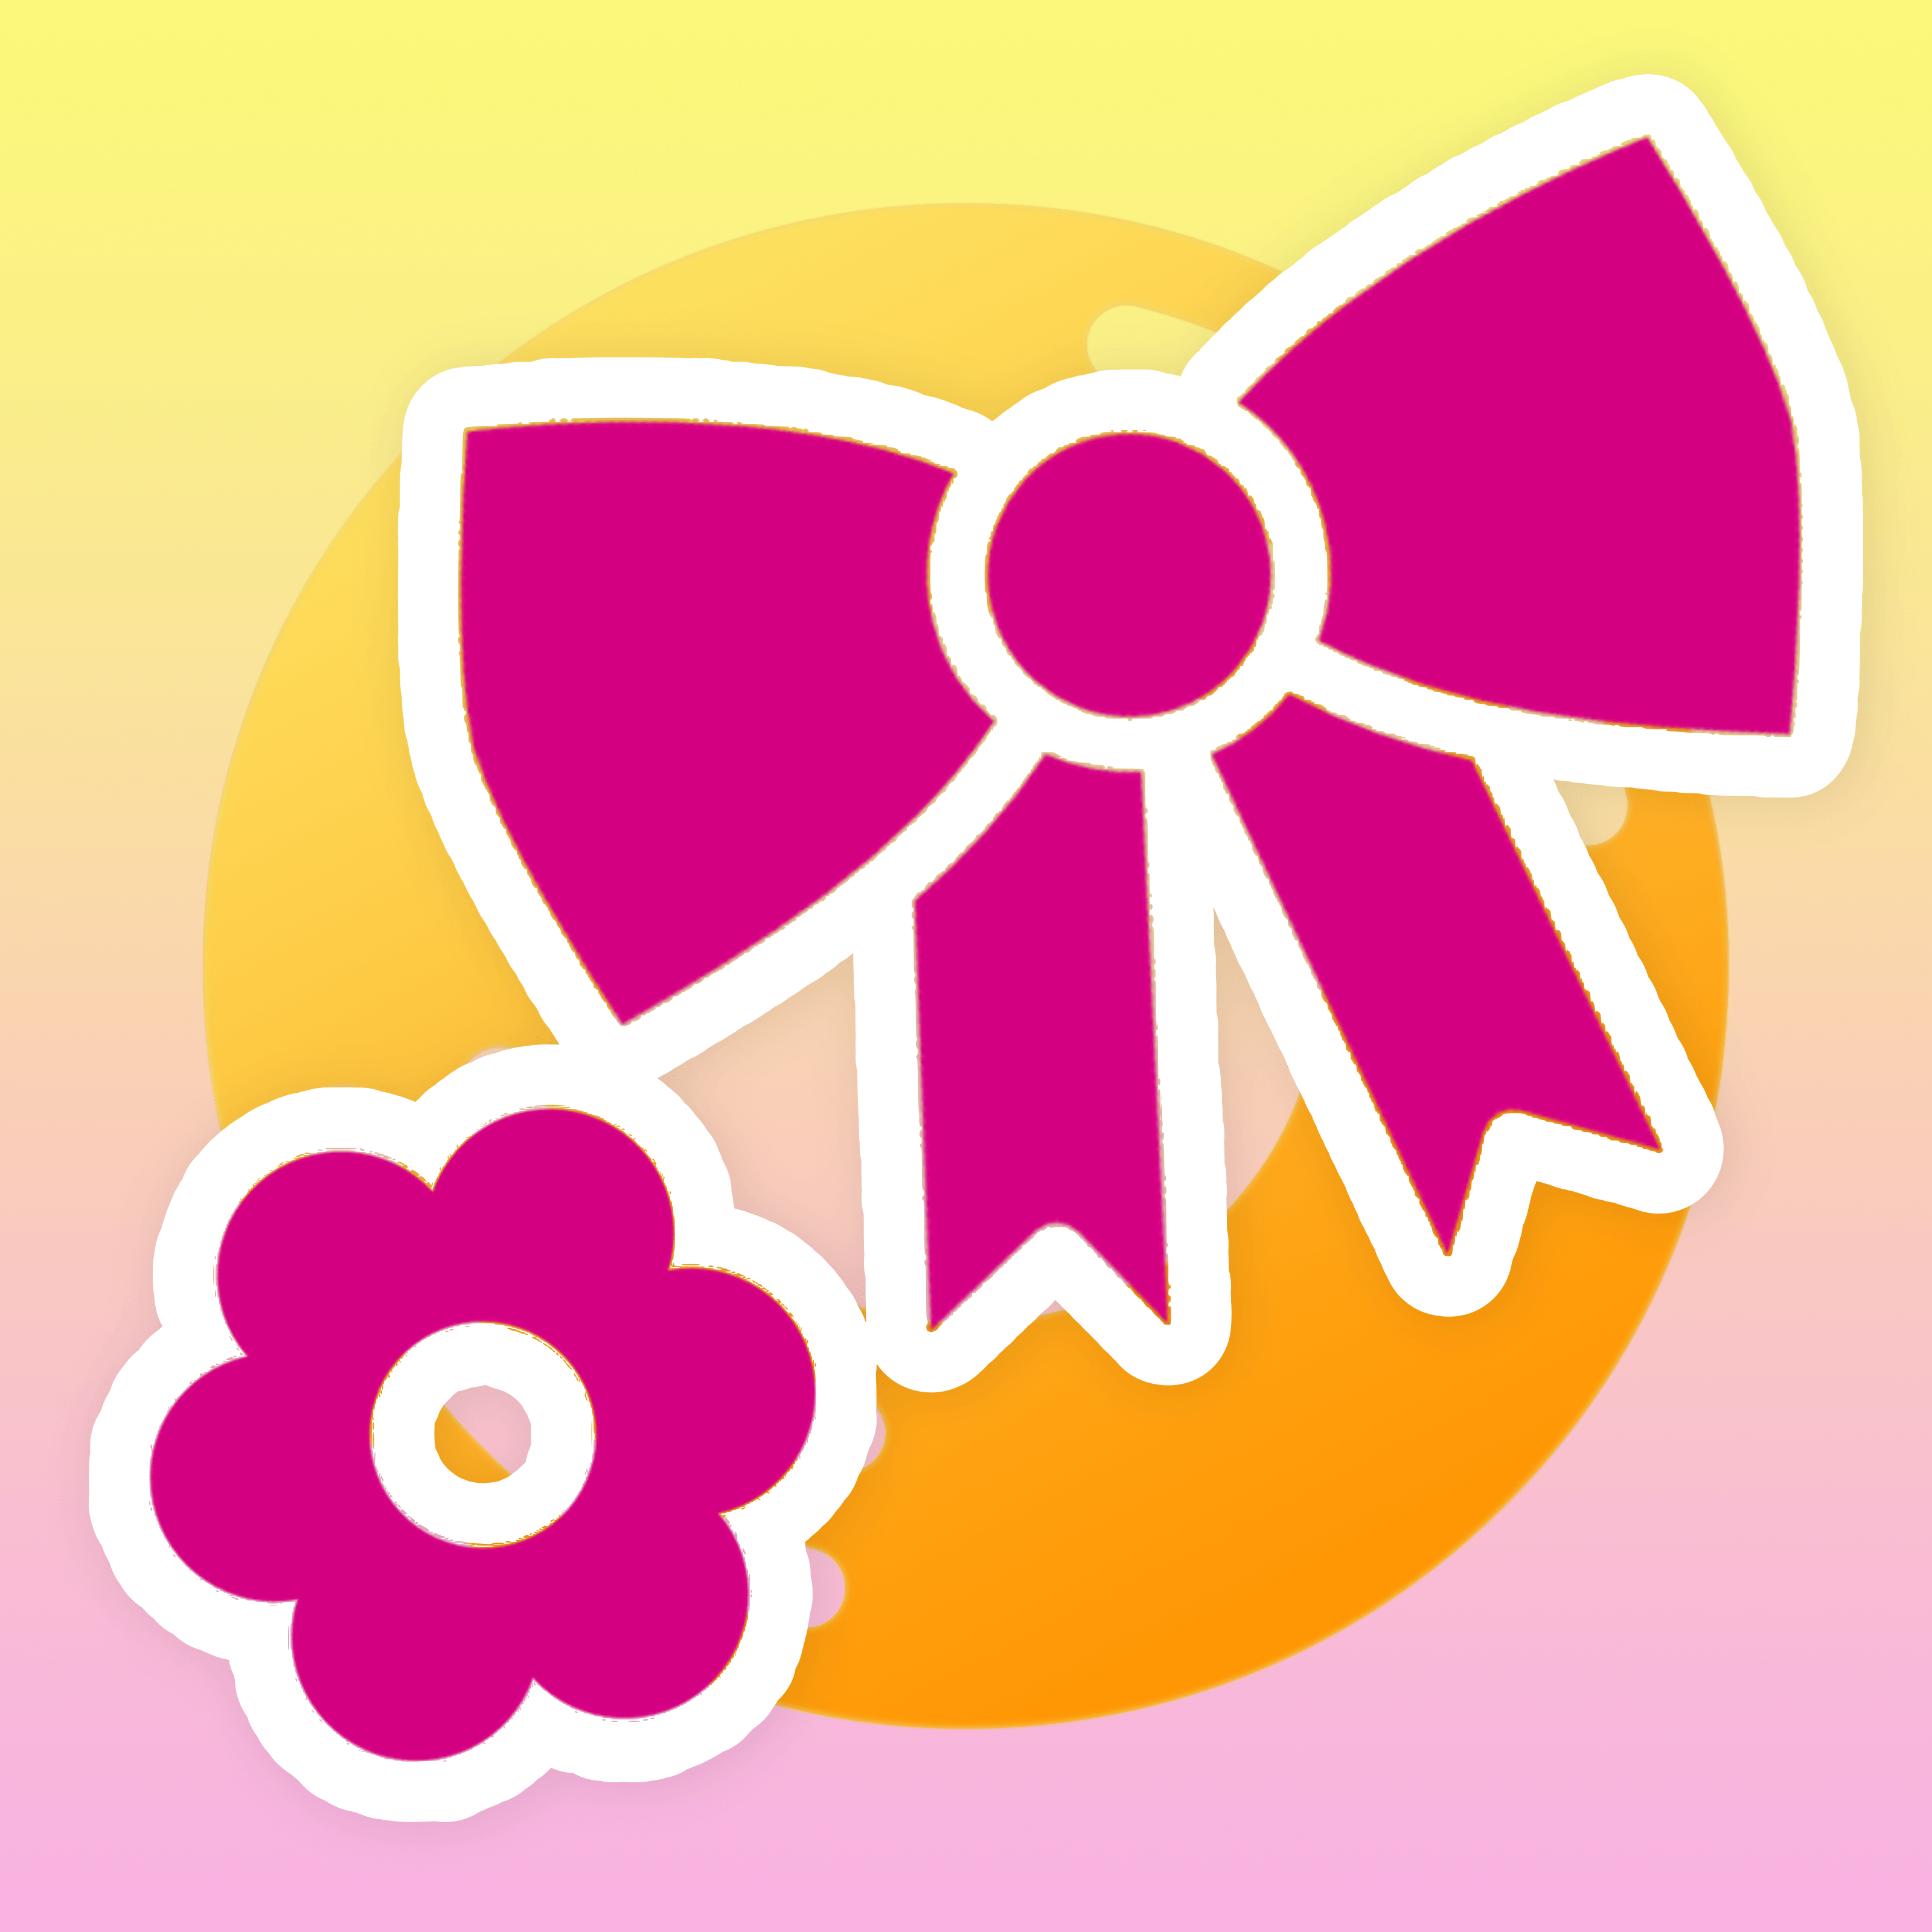 AleTokui20 avatar